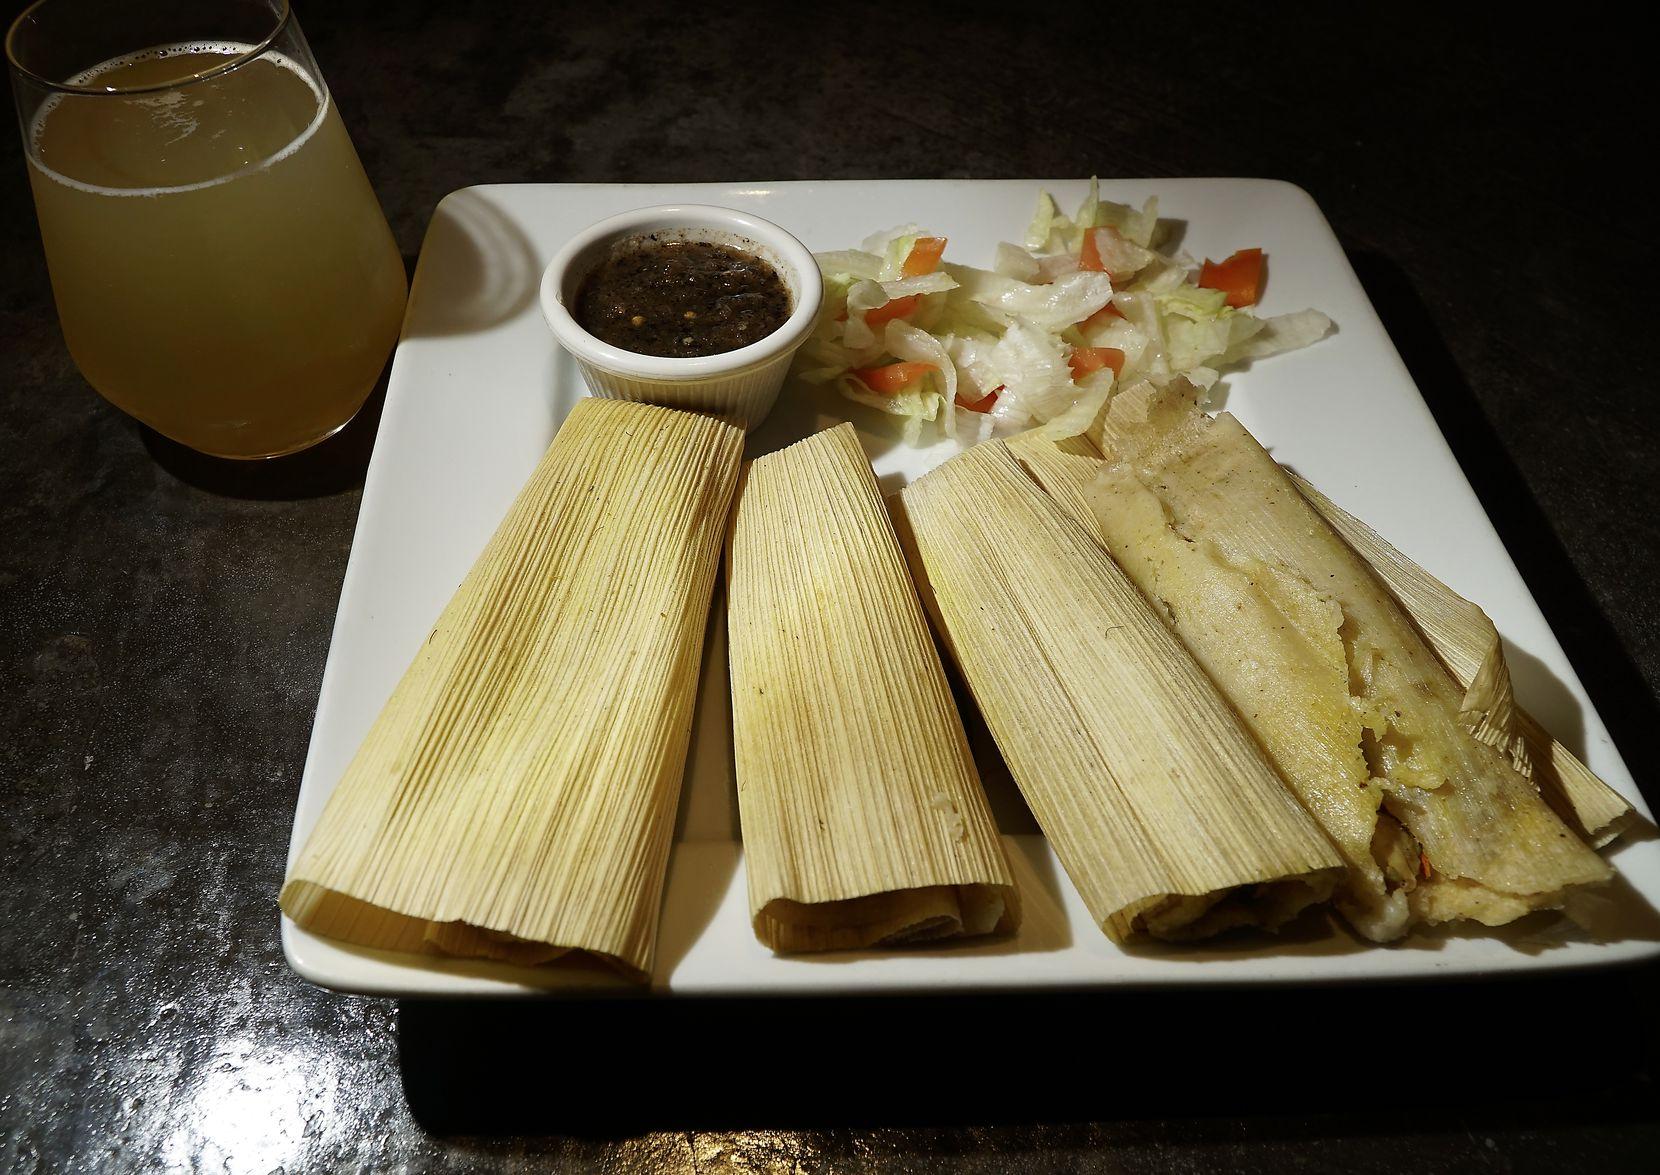 Mama's Tamales at Strangeways restaurant in Dallas